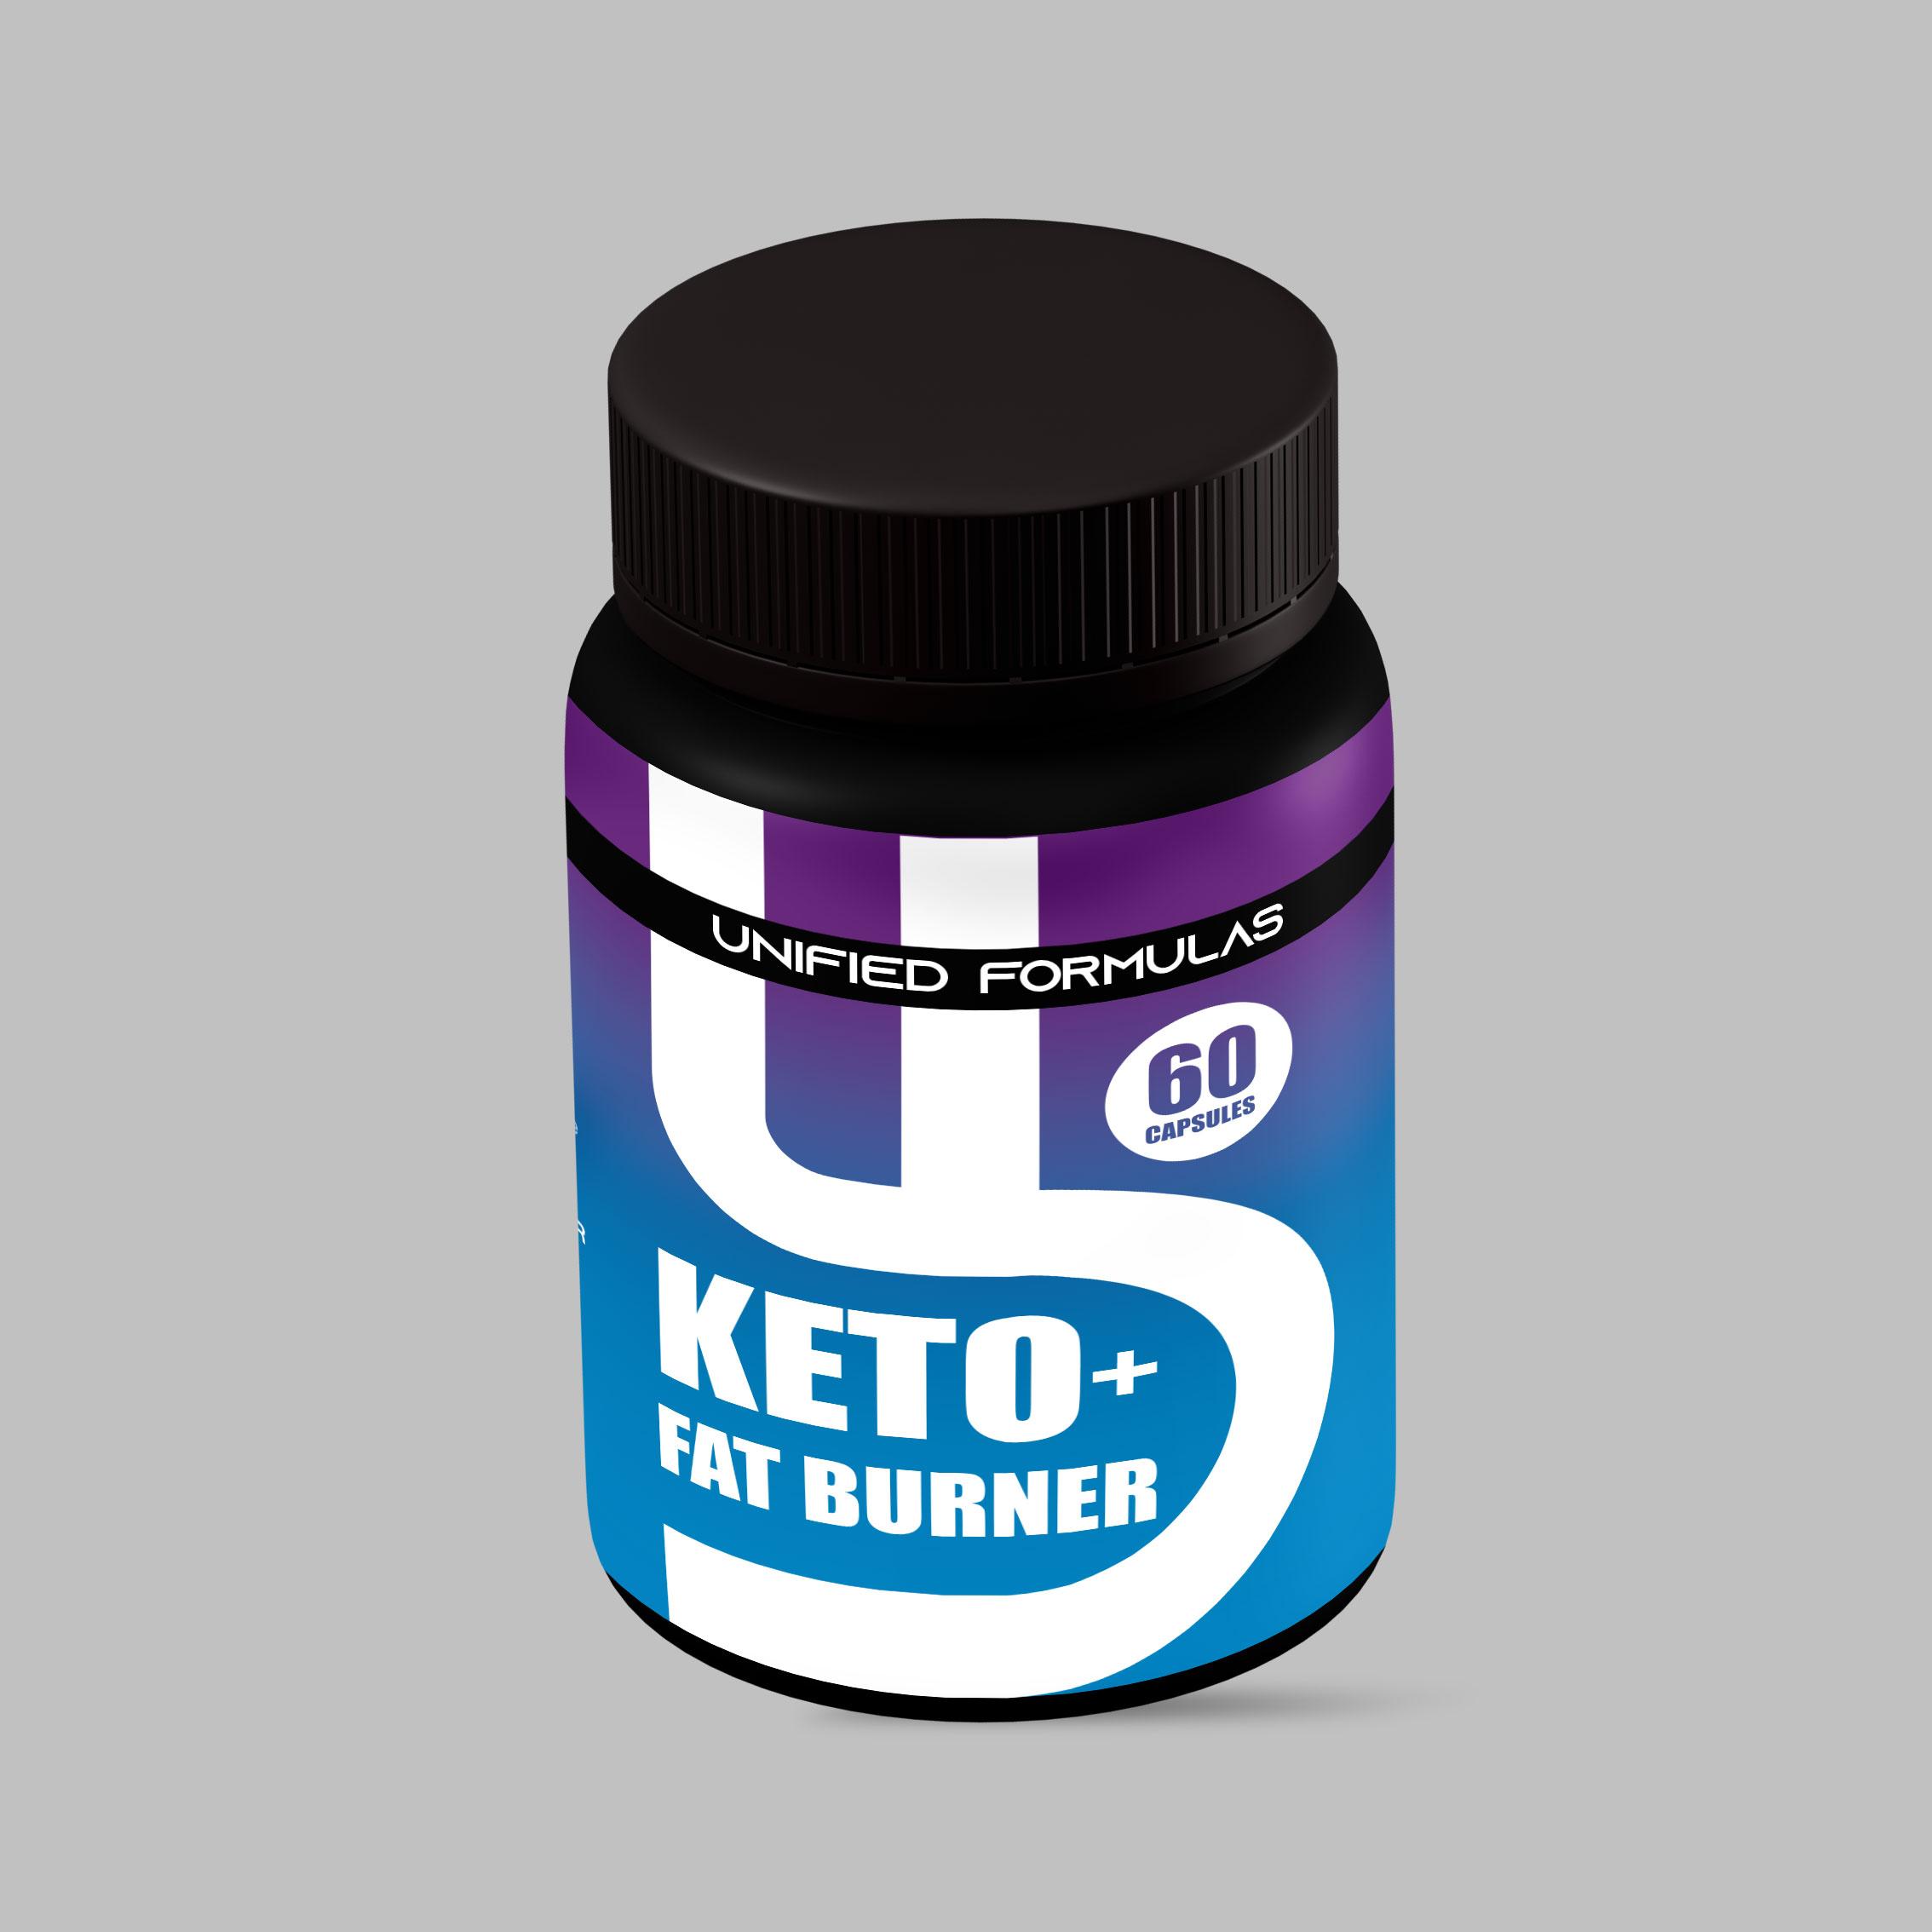 UF KETO FAT BURNER